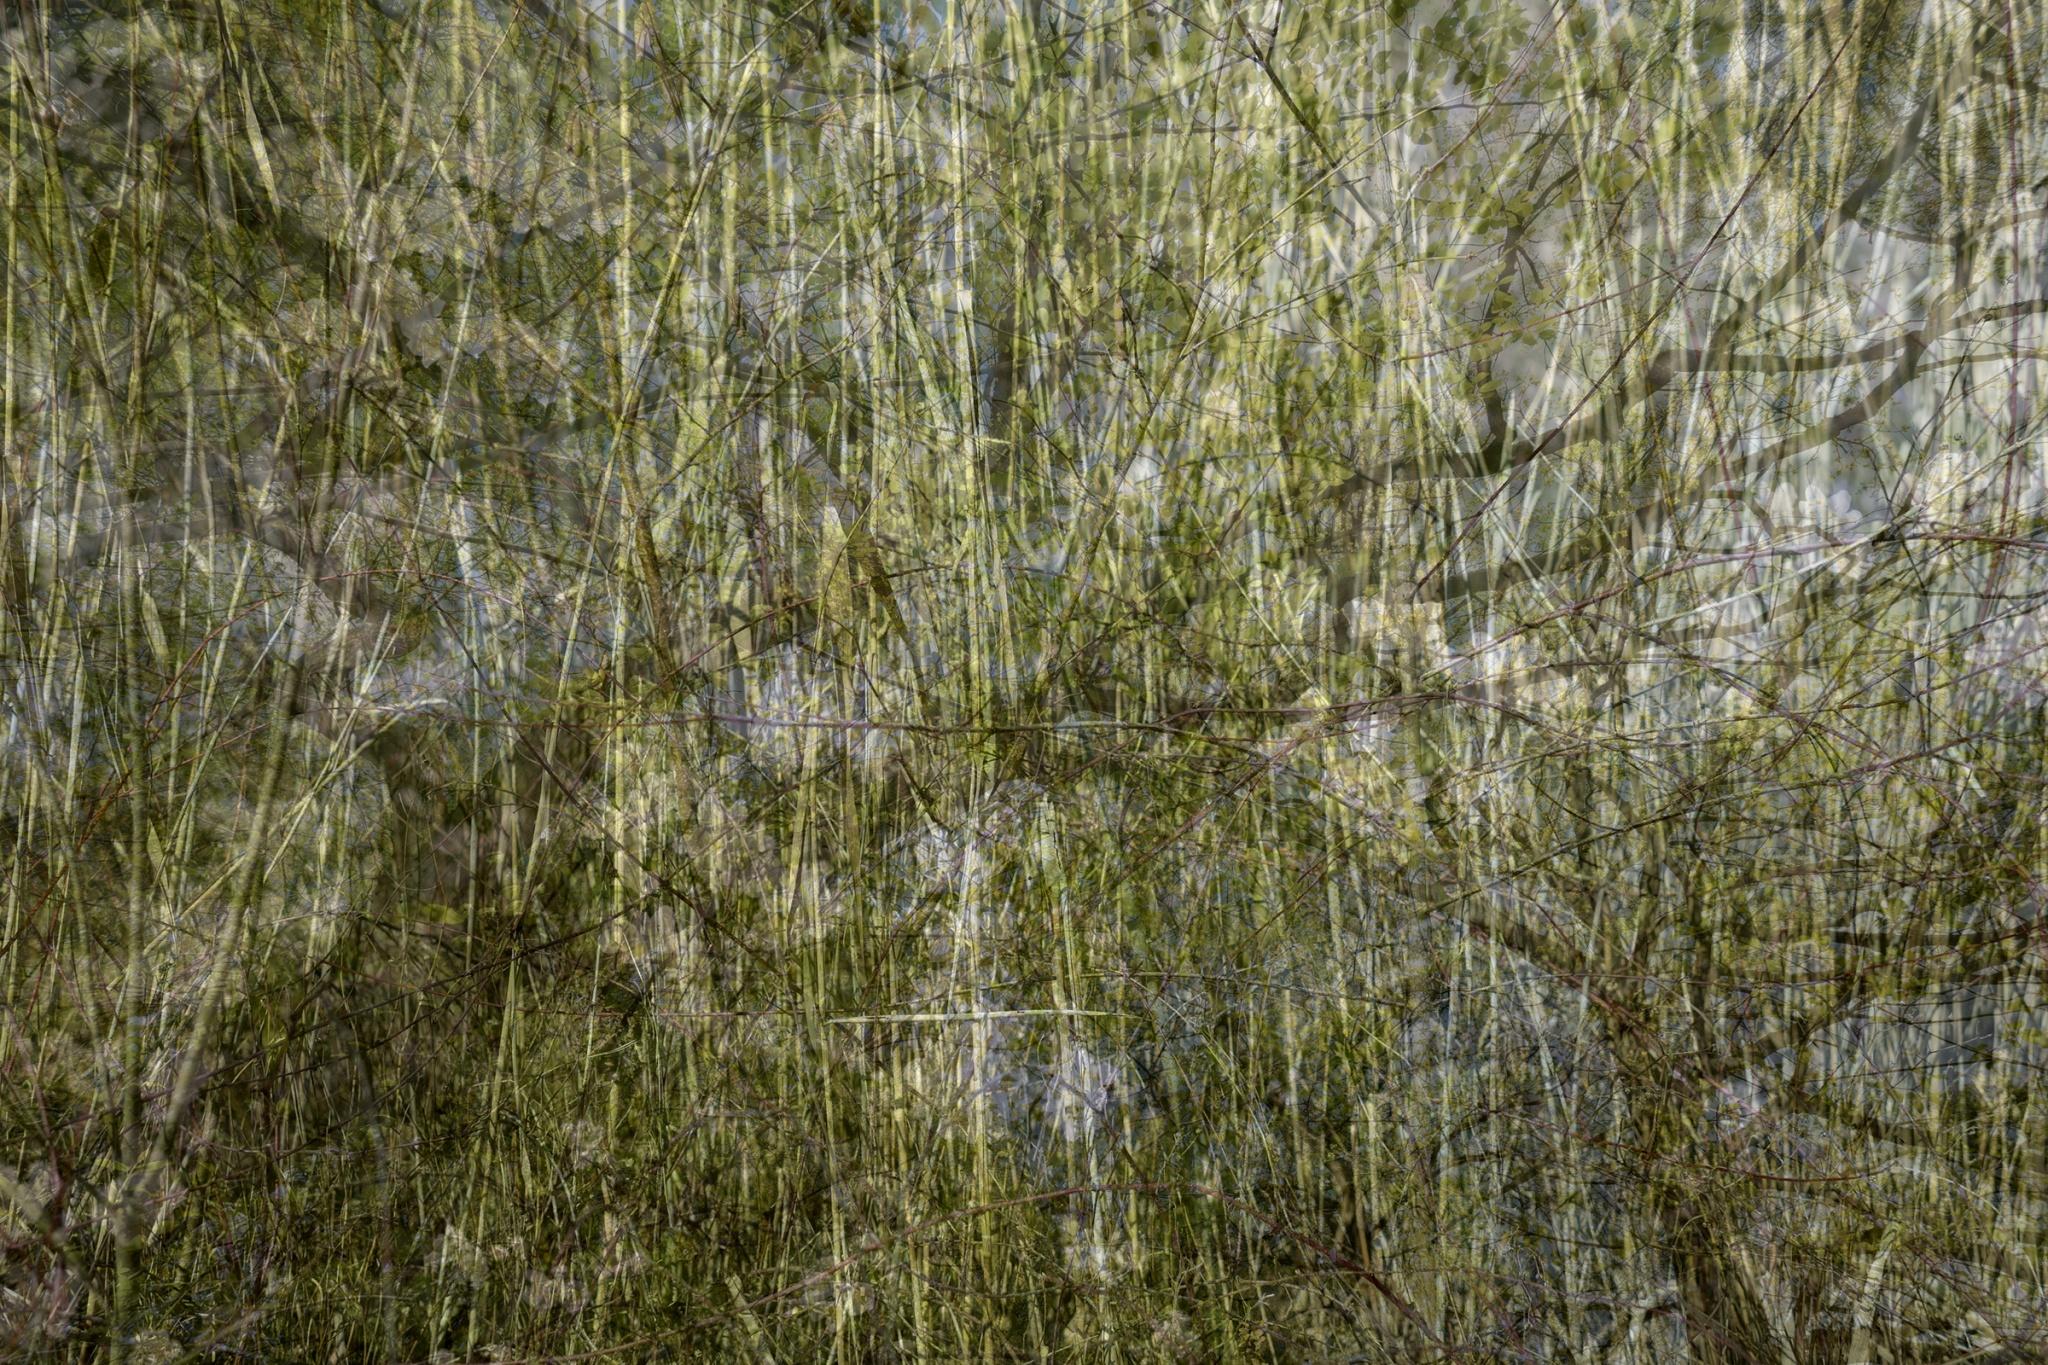 Thomas Teske photography - see the world through my eyes